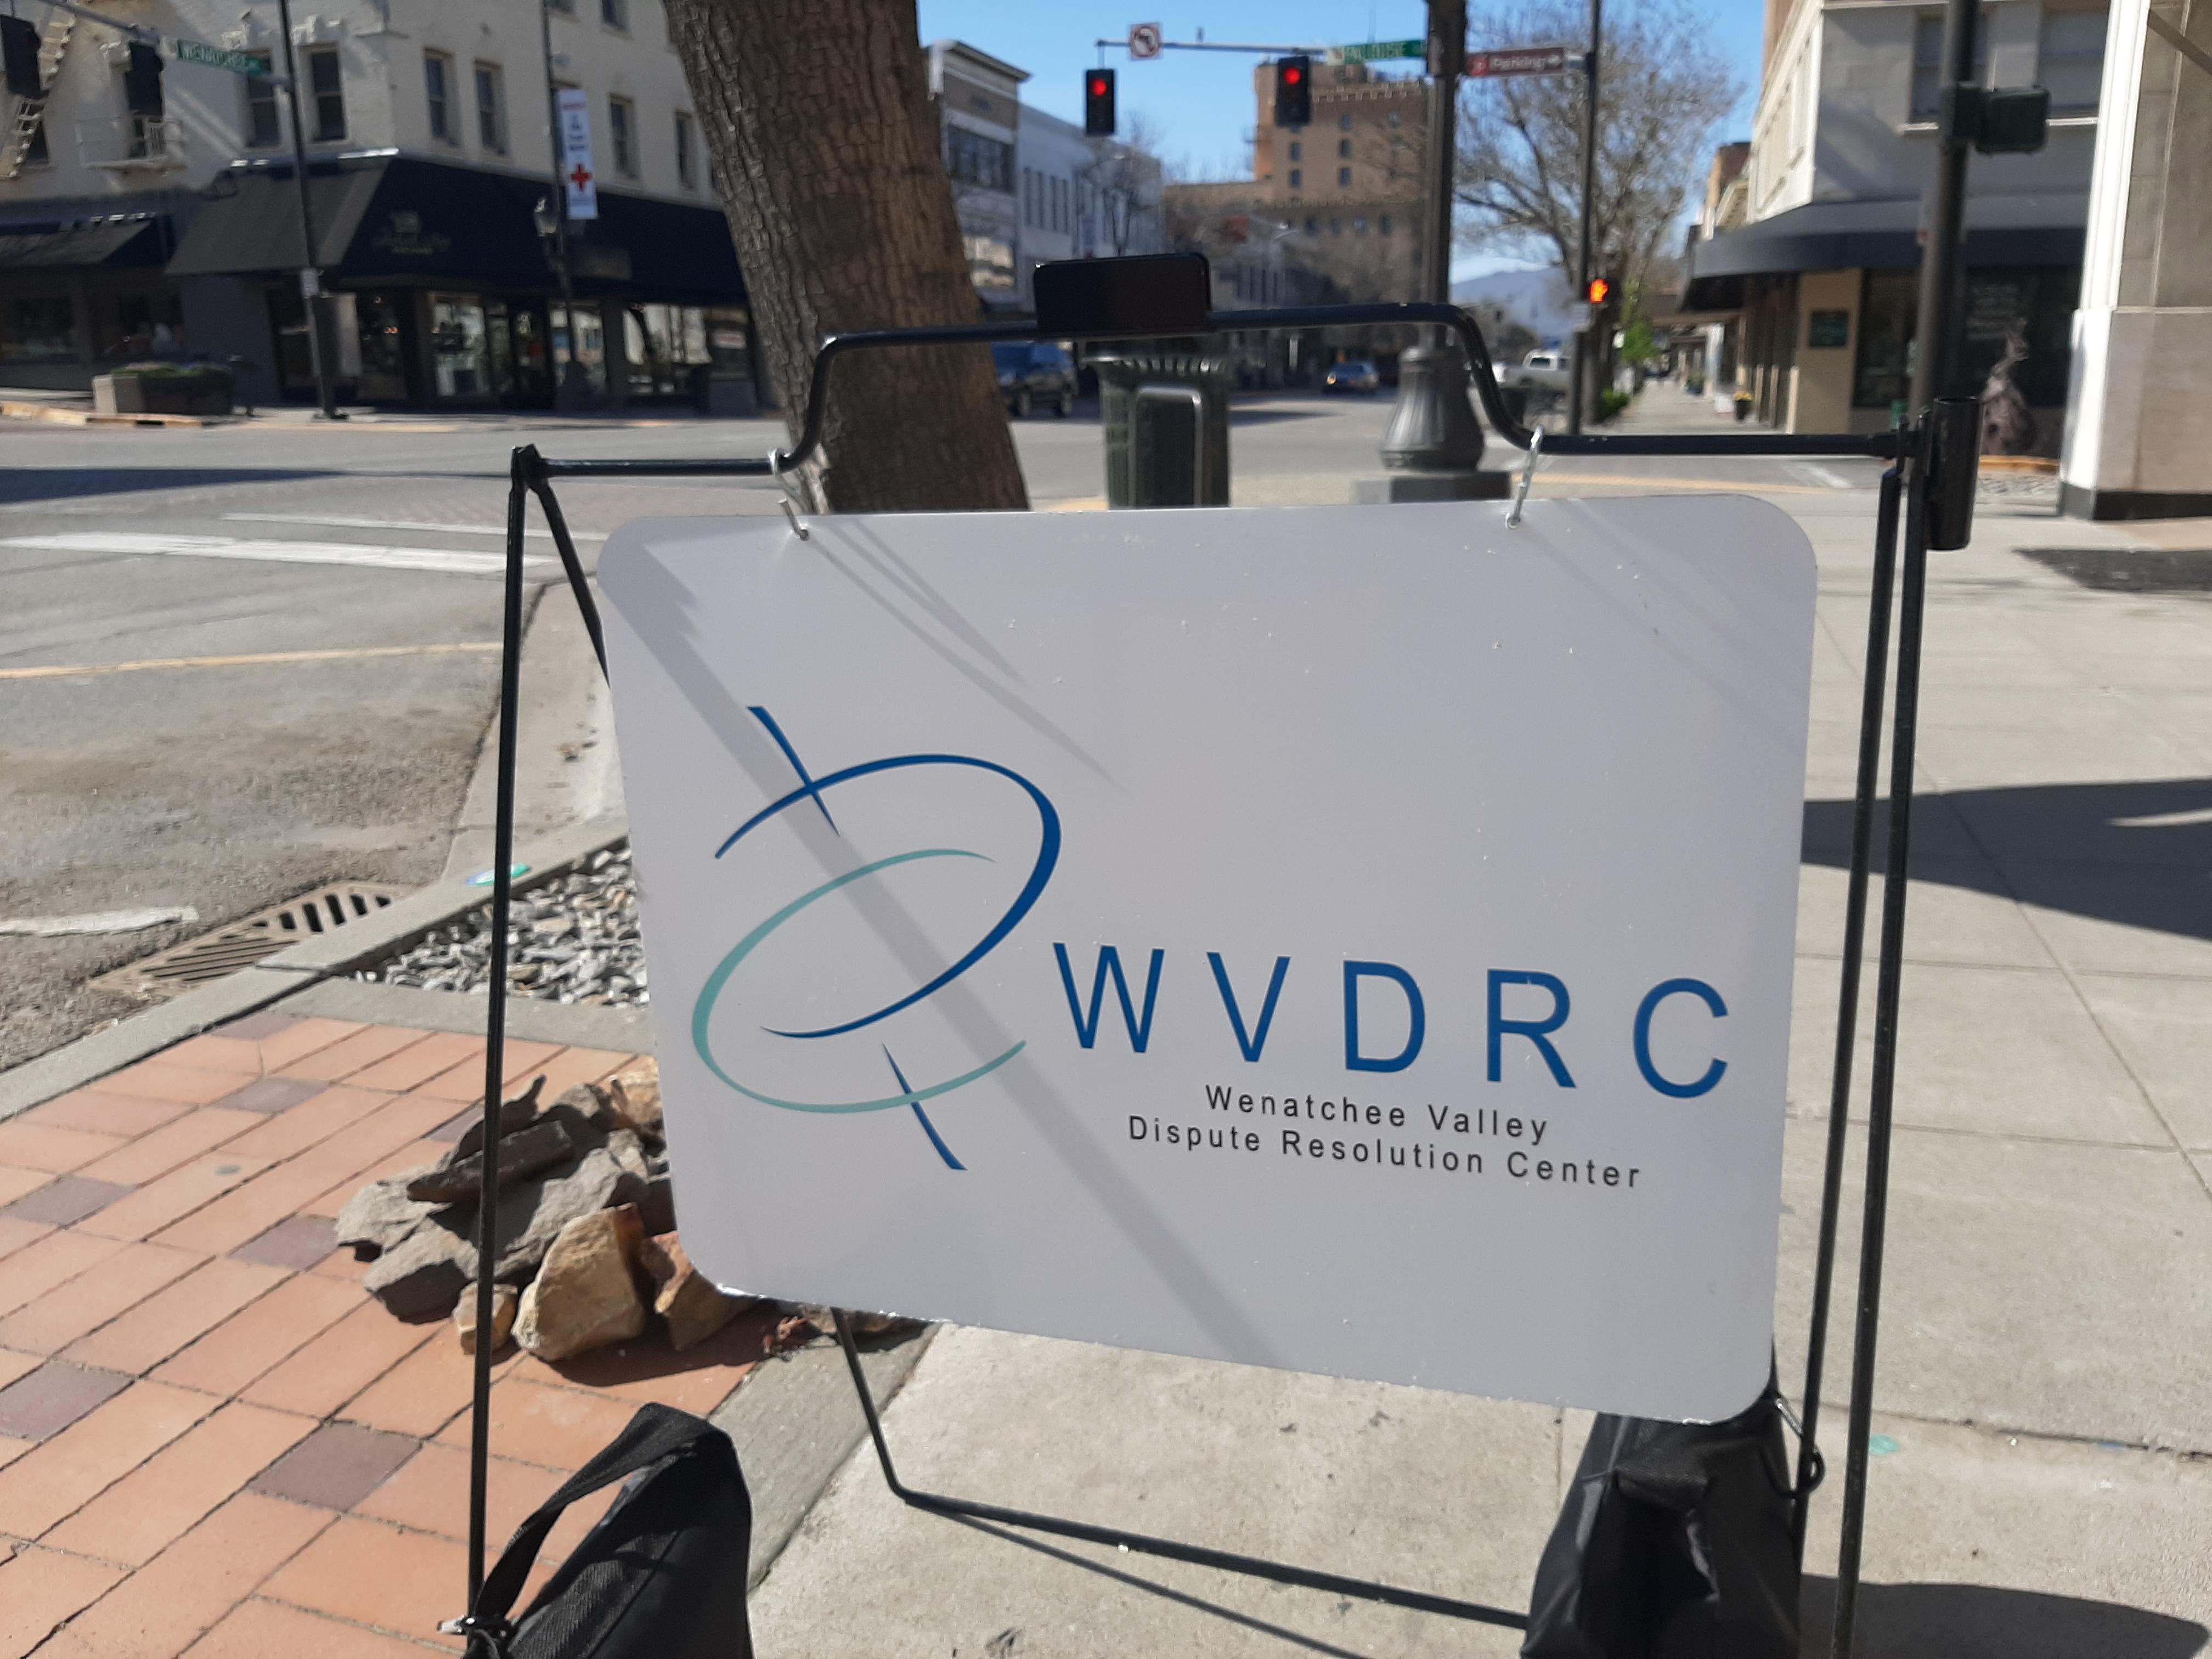 WVDRC sidewalk sign.jpg